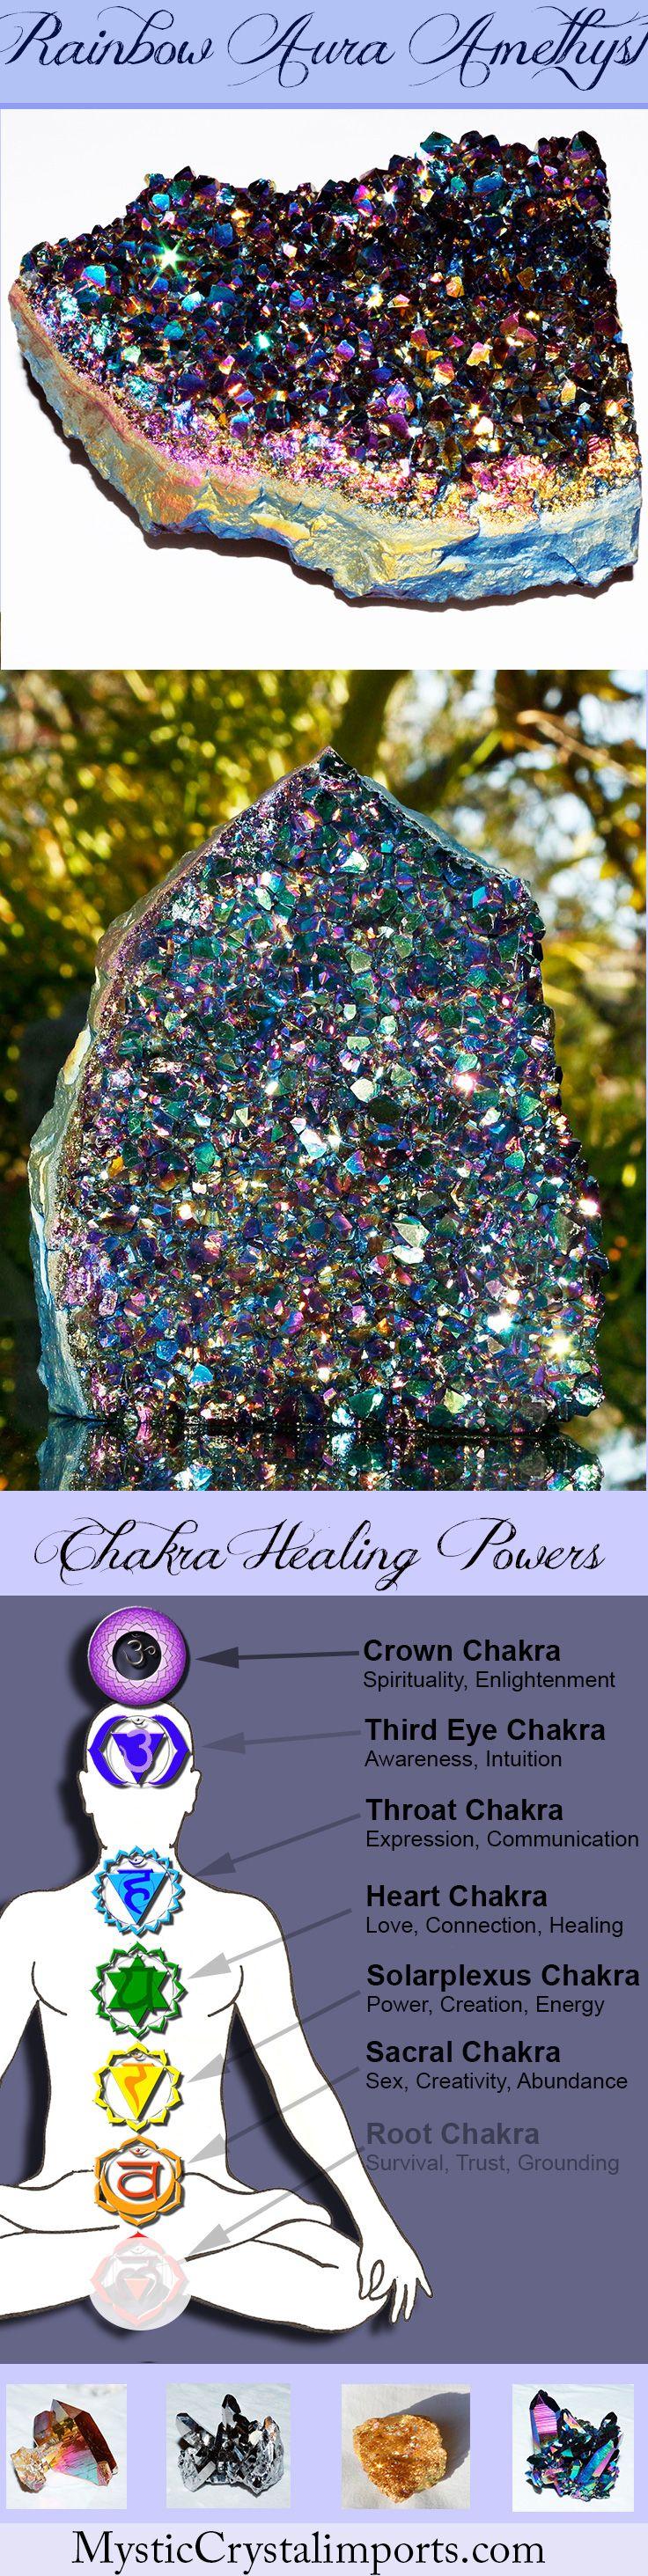 "4 1/2"" Tall Rainbow Aura Amethyst Quartz Standing Geode Cluster"